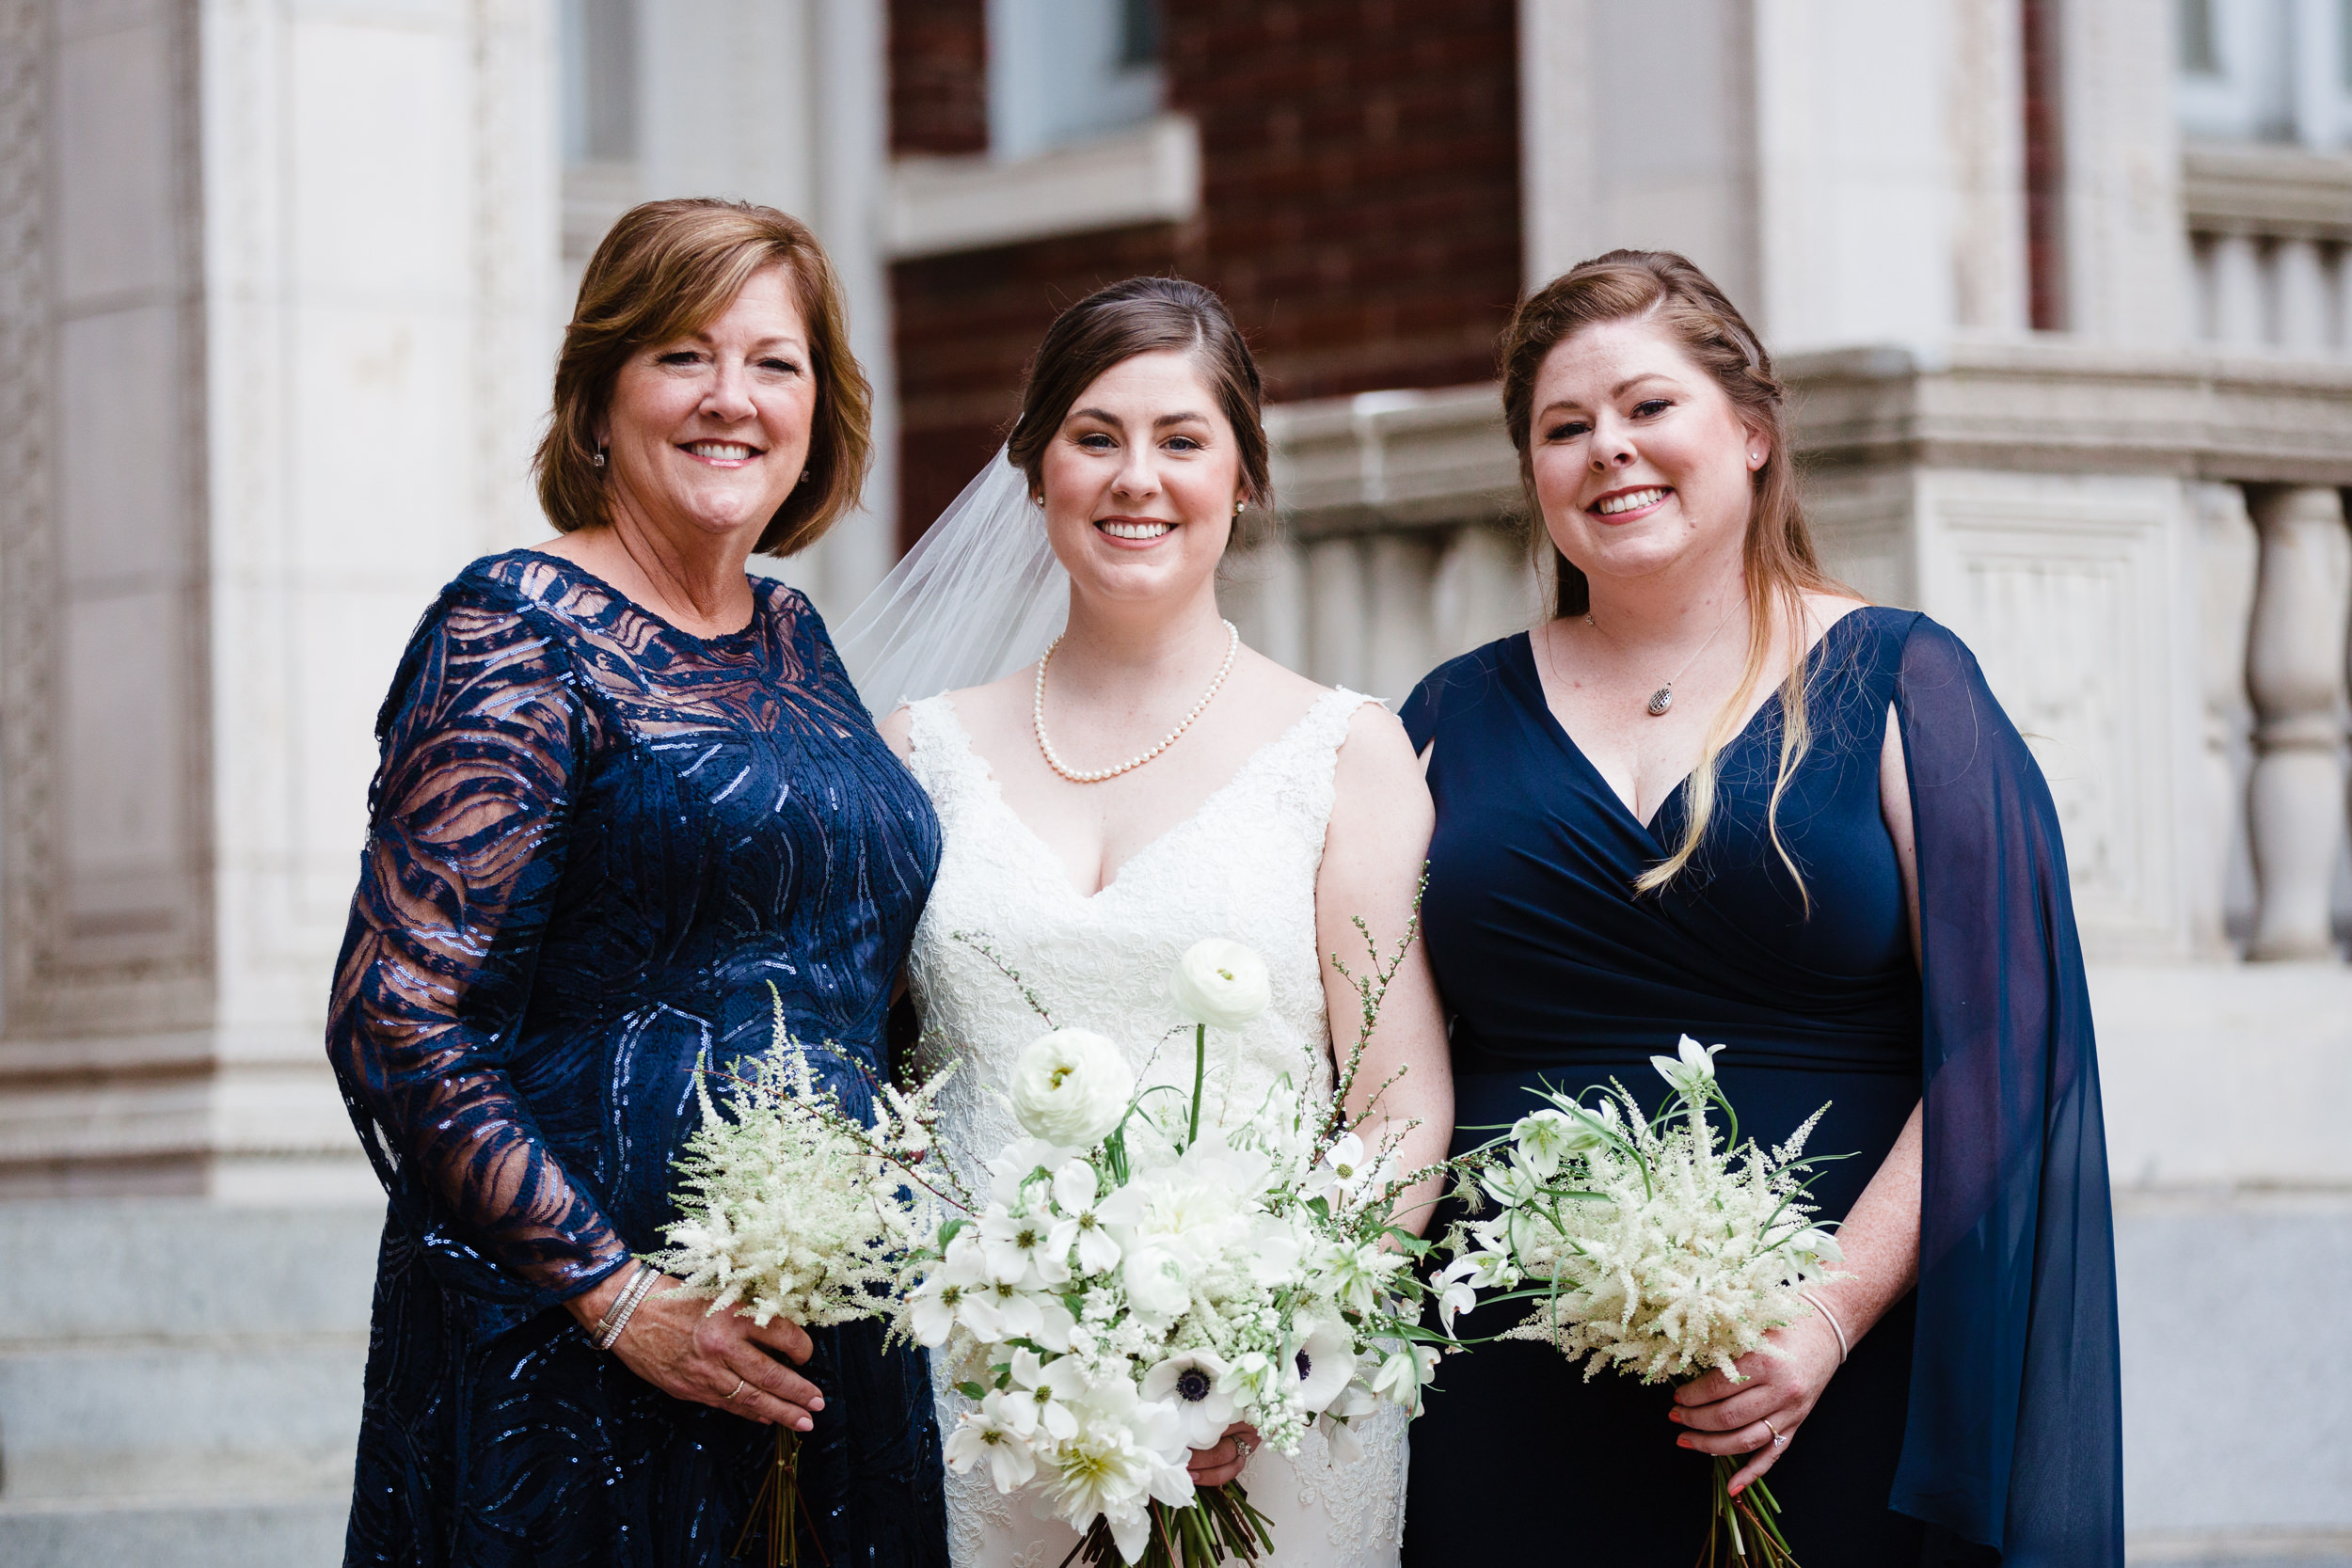 LK_Birmingham_AL_Wedding_2019-00022.jpg